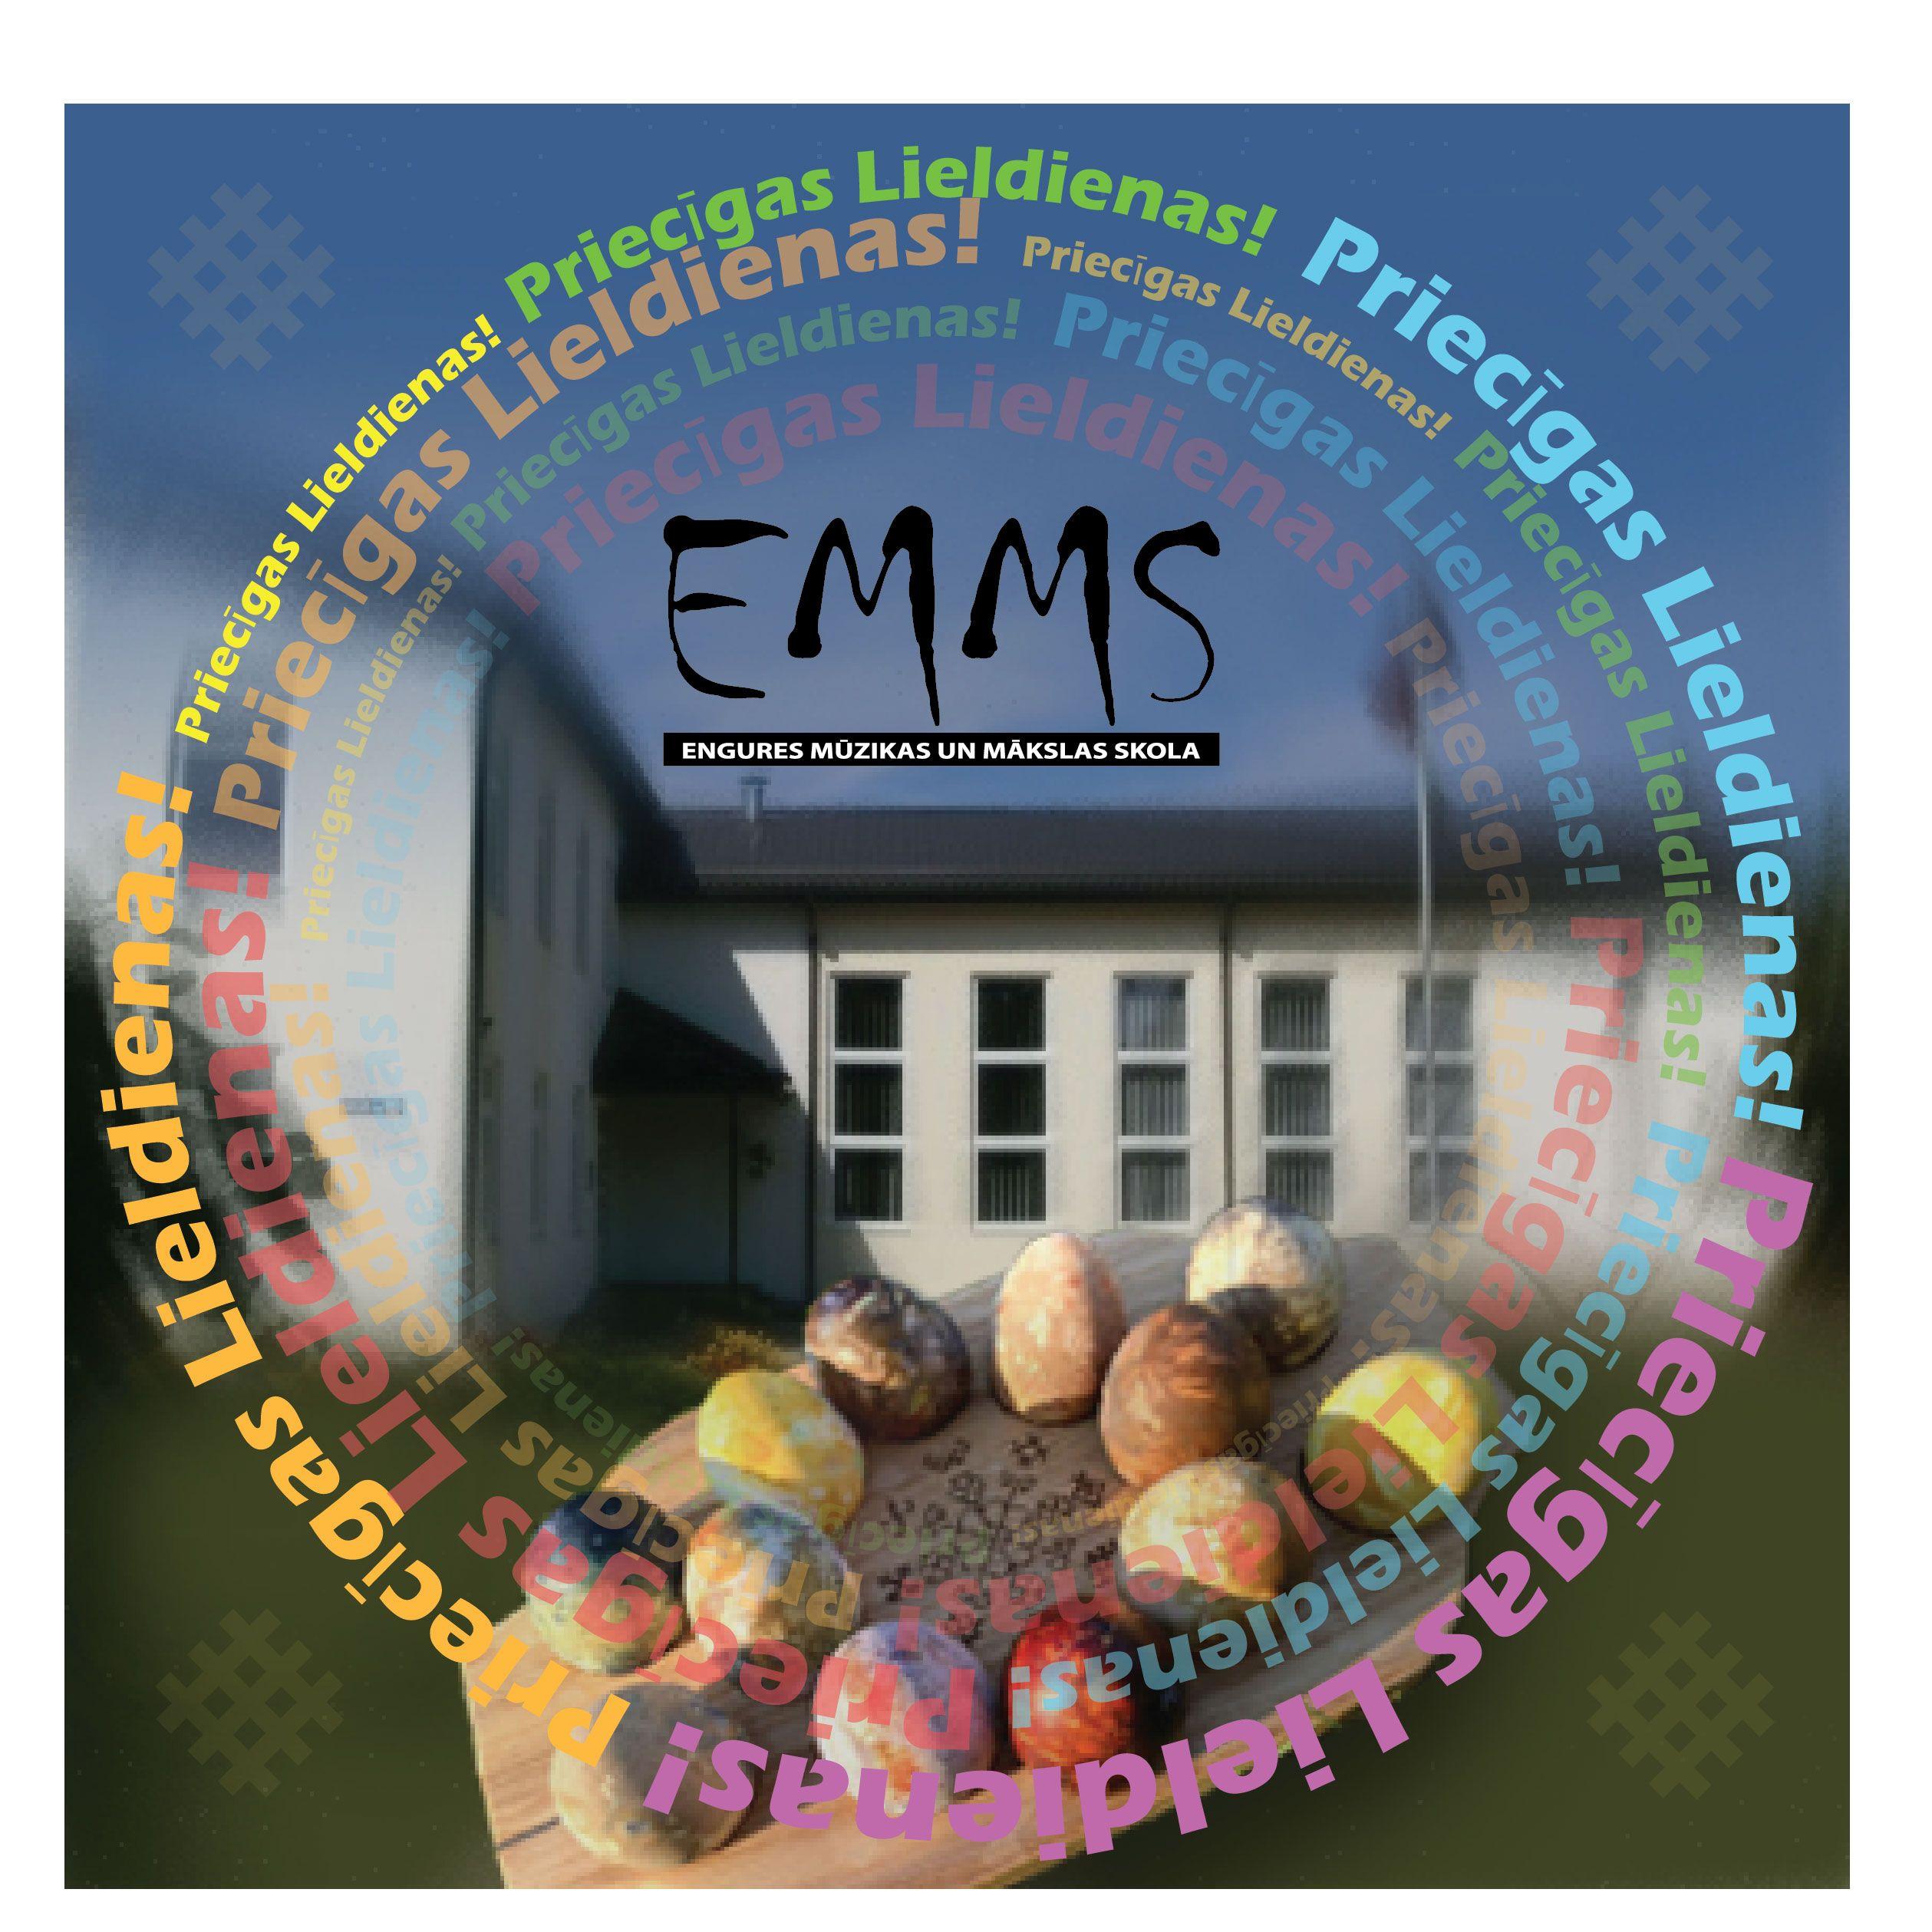 EMMS-Lieldienas